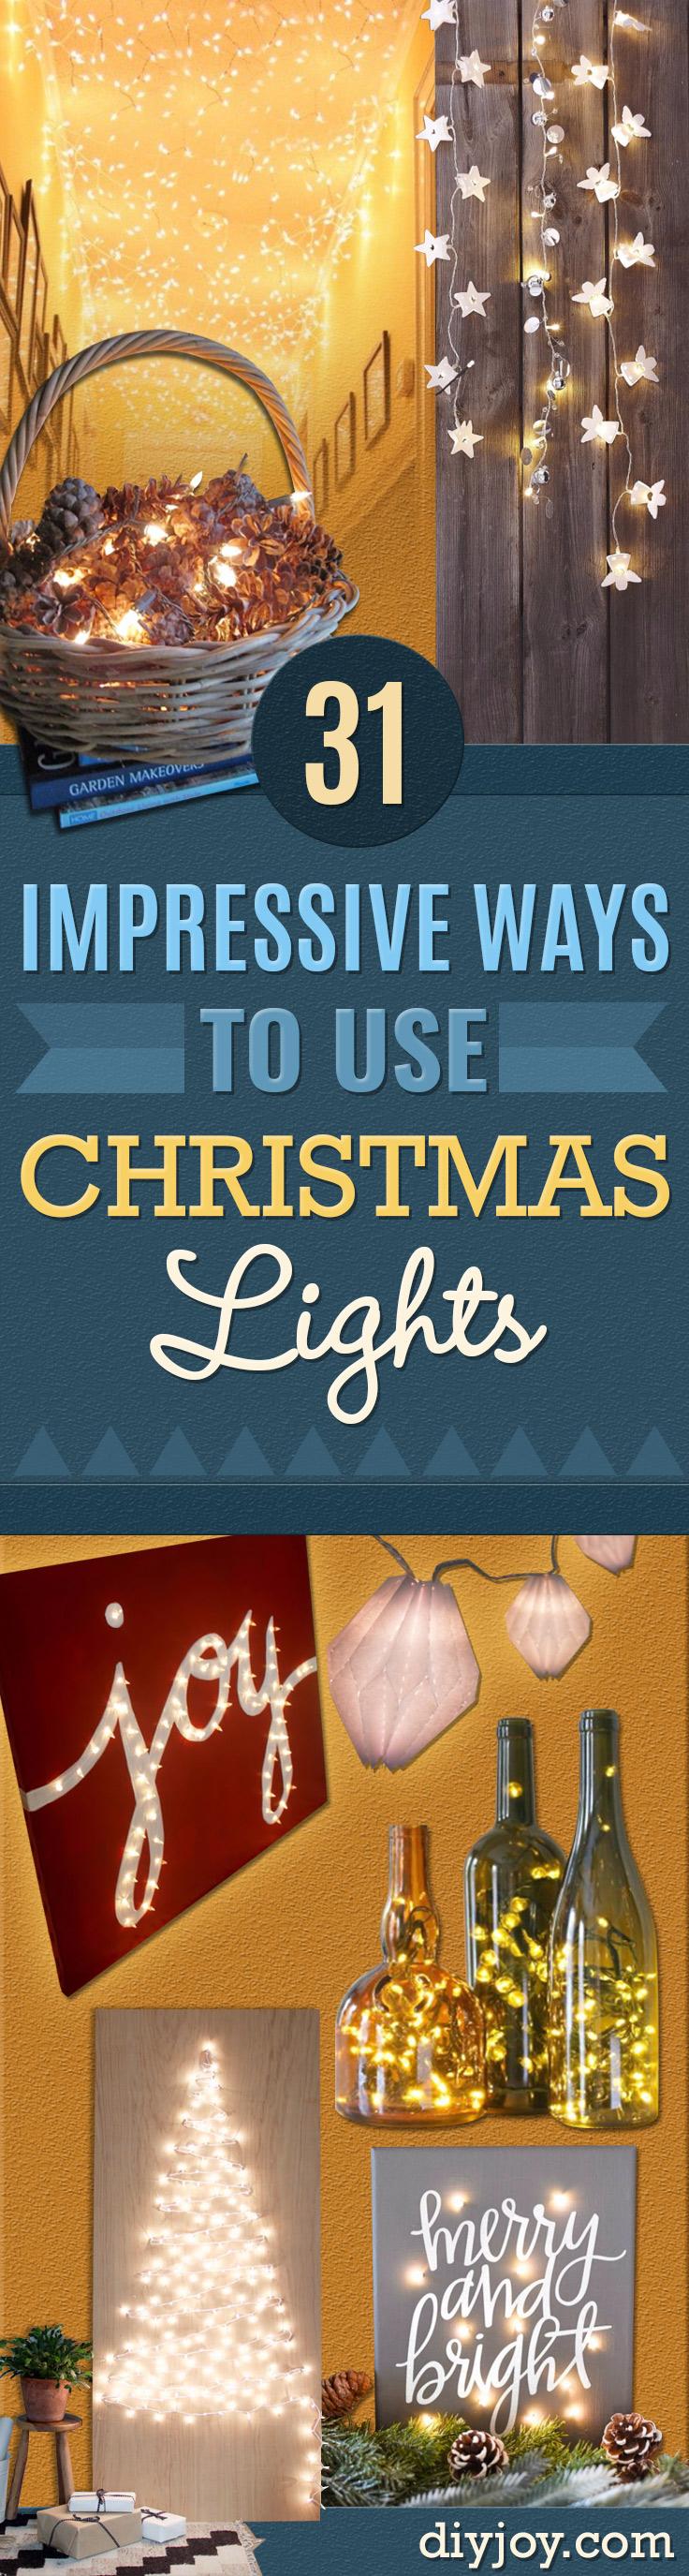 DIY String Light Ideas - Cool Ways To Use Christmas Lights - Best Easy DIY Ideas for String Lights for Room Decoration, Home Decor and Creative DIY Bedroom Lighting - Creative Christmas Light Crafts #christmas #diy